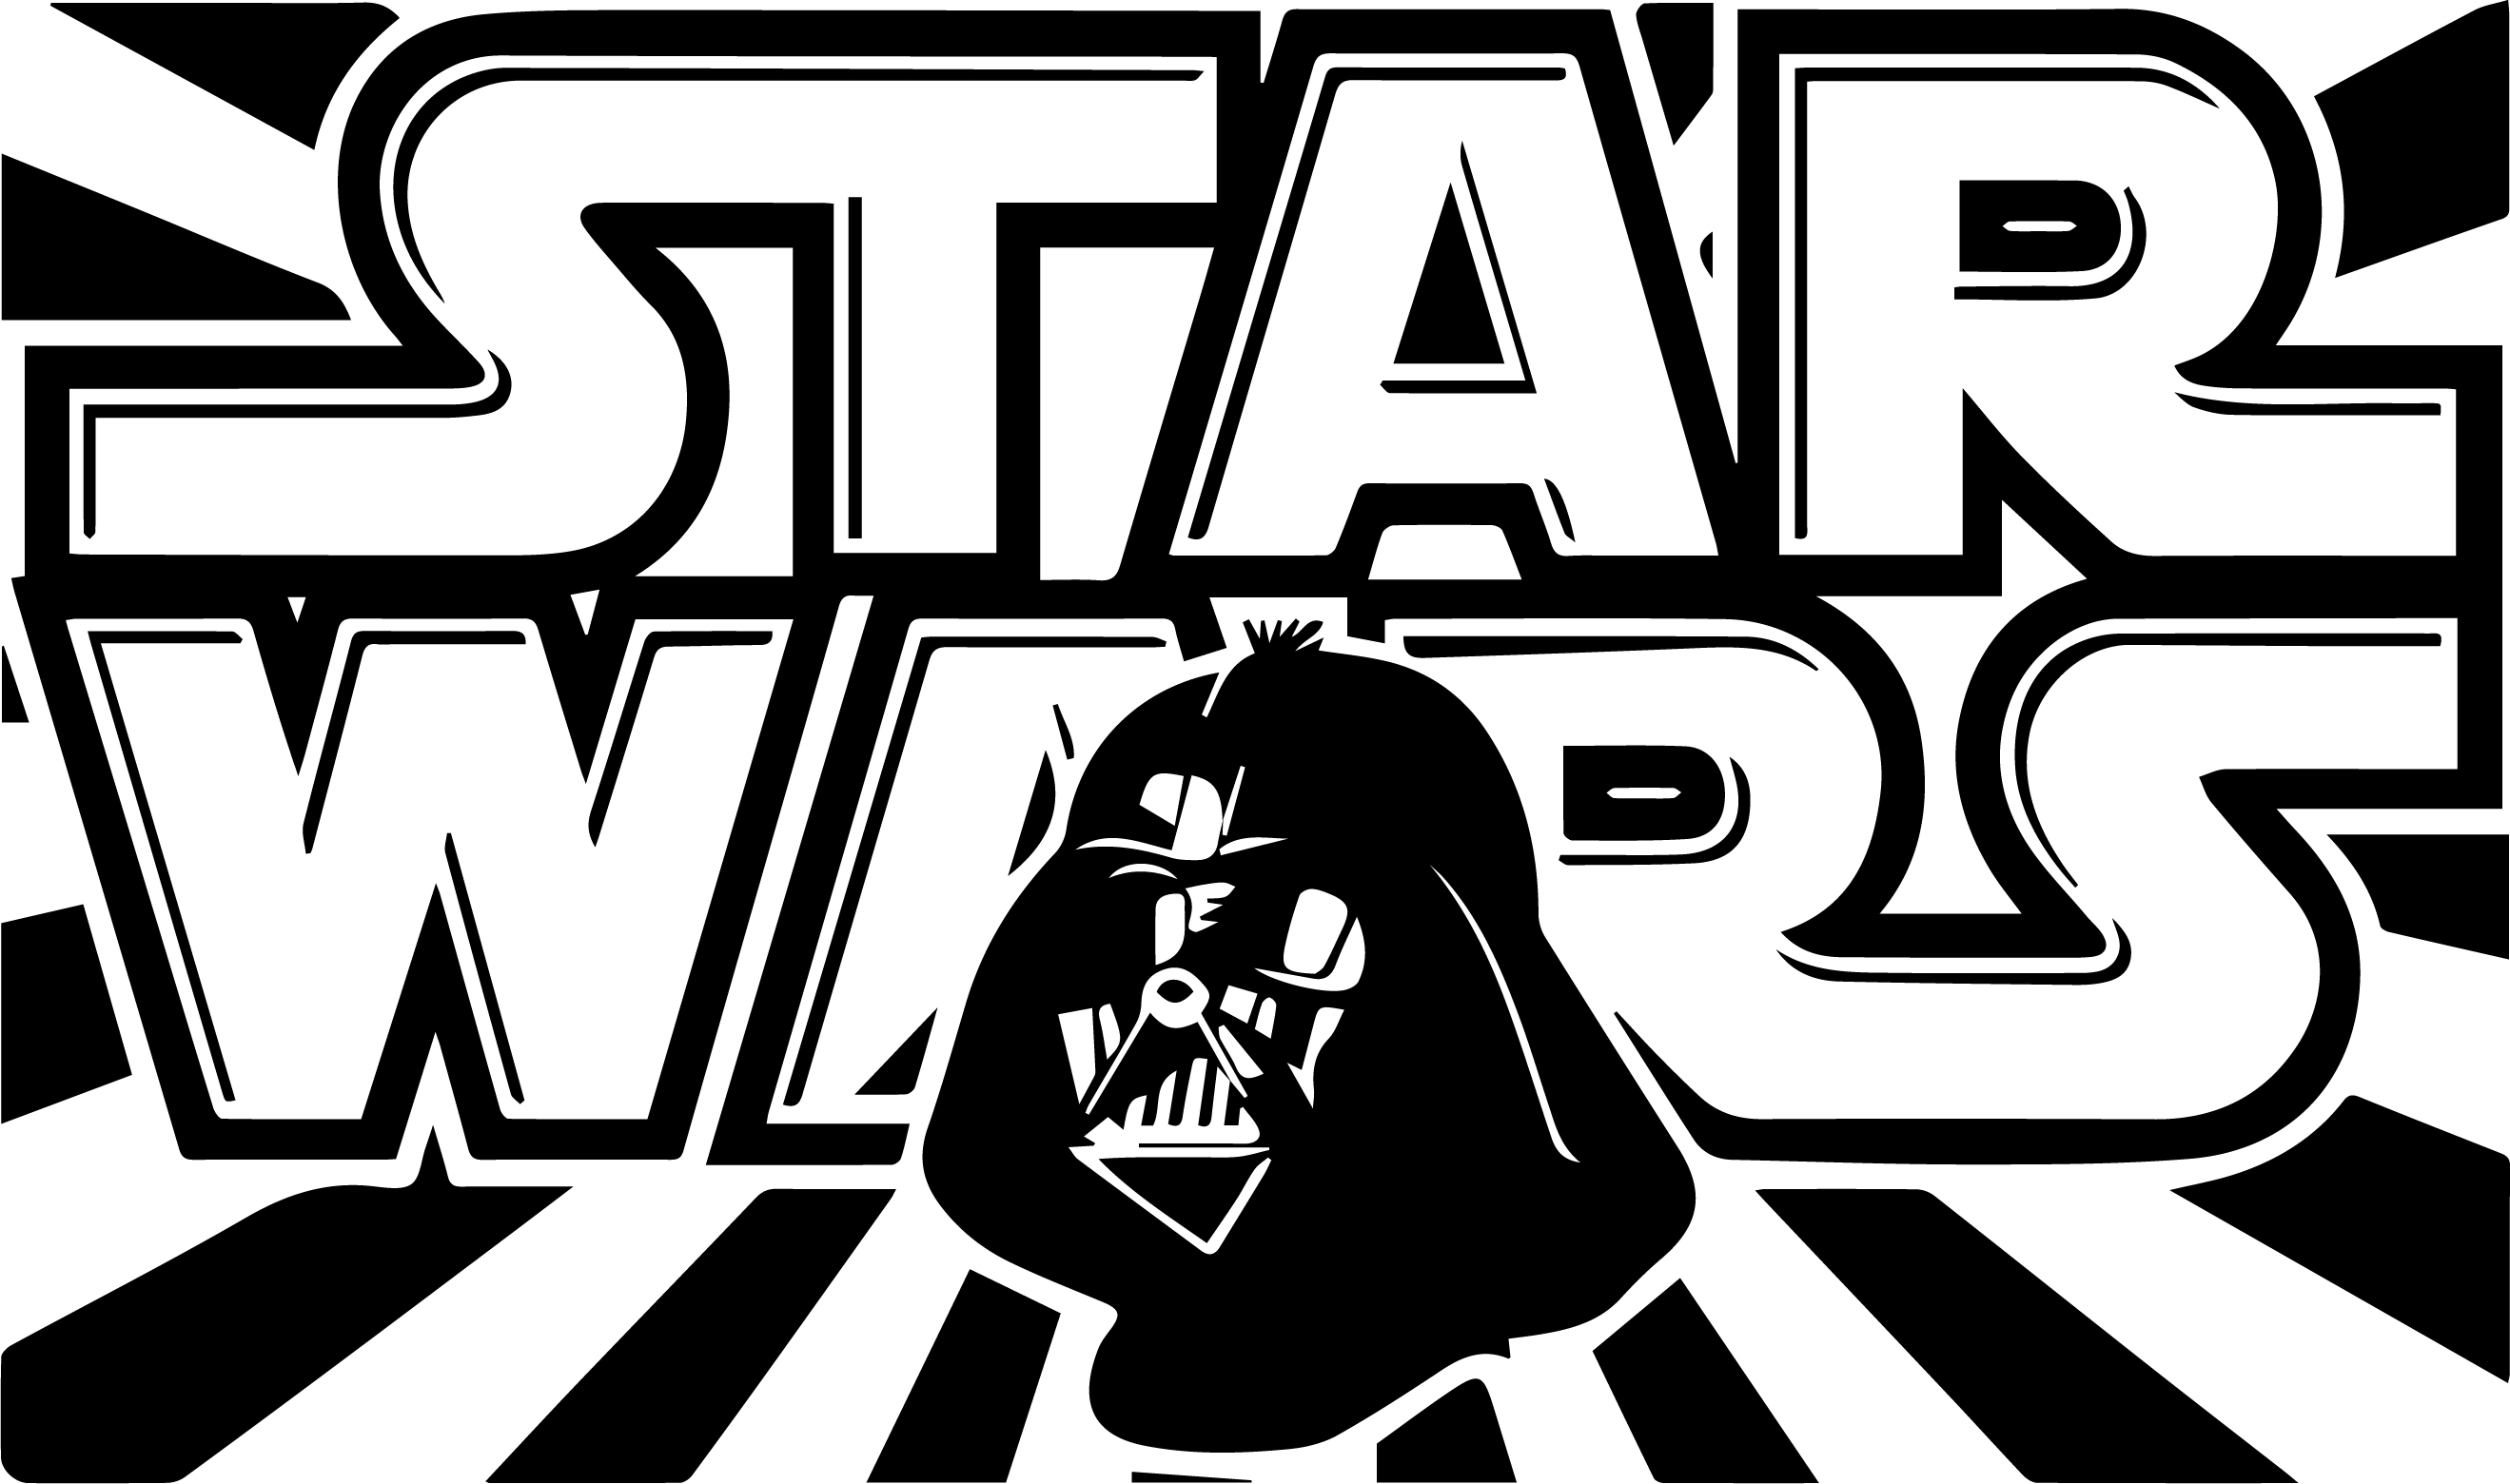 Adesivo de Parede Star Wars  Adesivoteca  Quarto, sala, Infantil